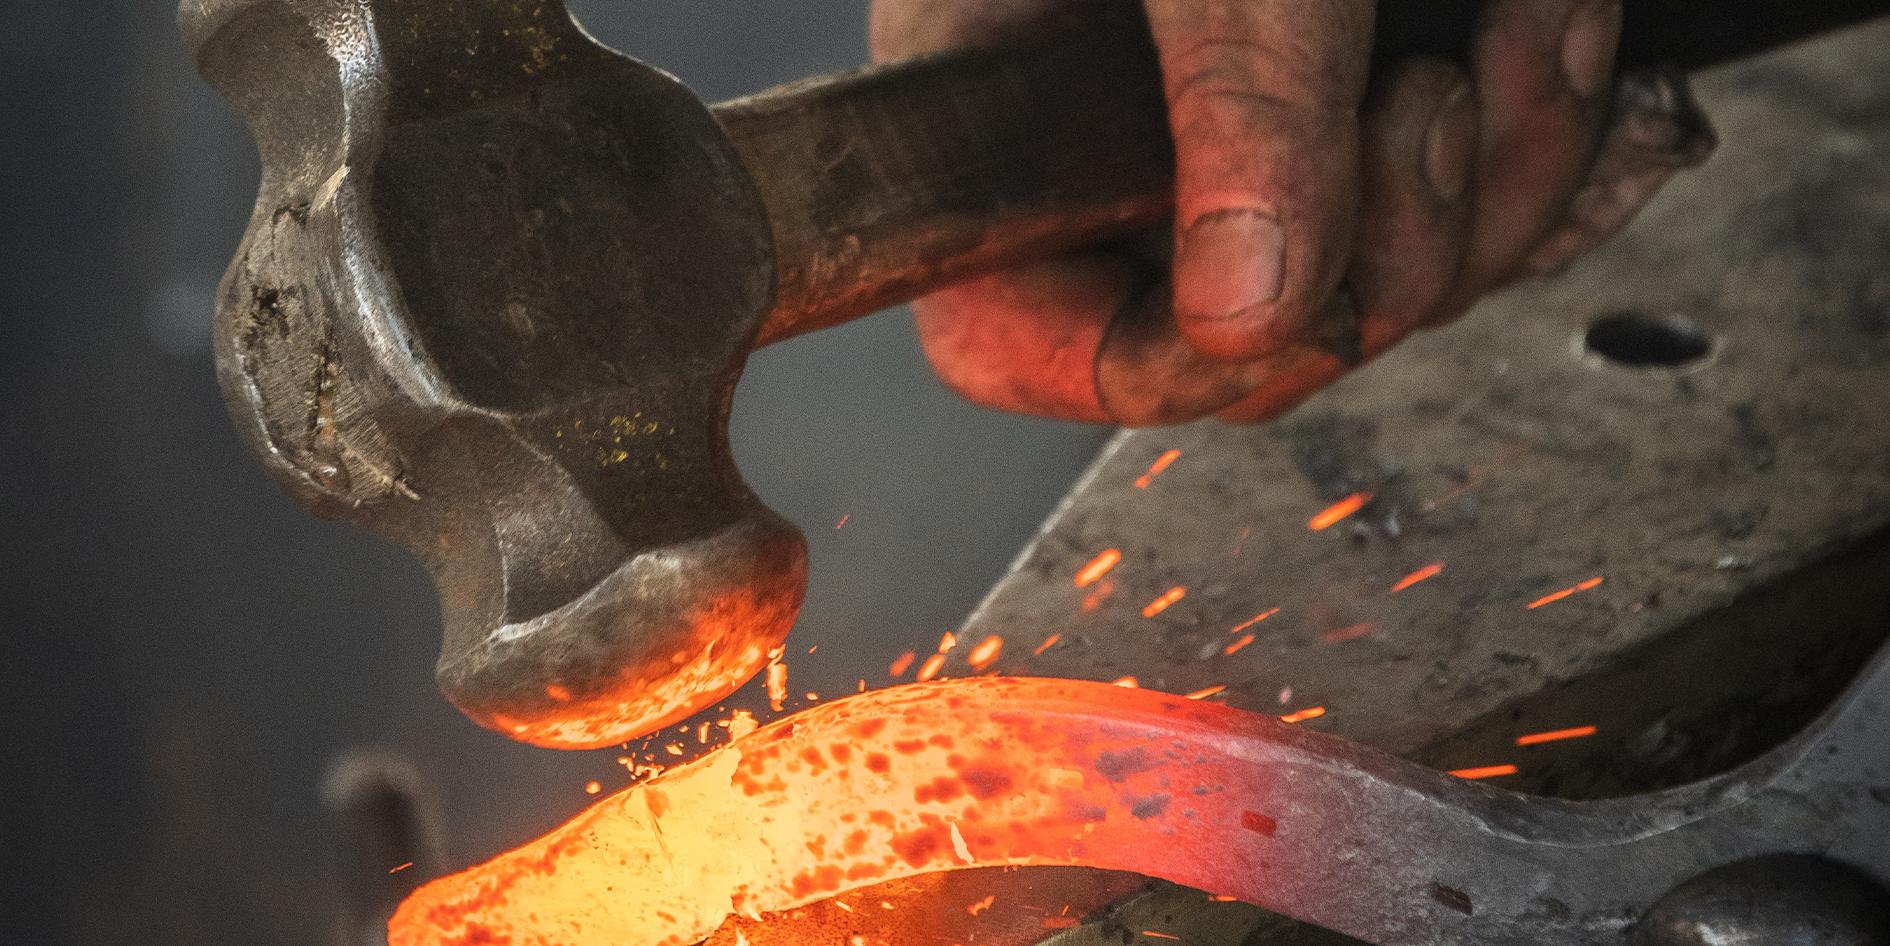 A Blacksmith hand hammering hot metal